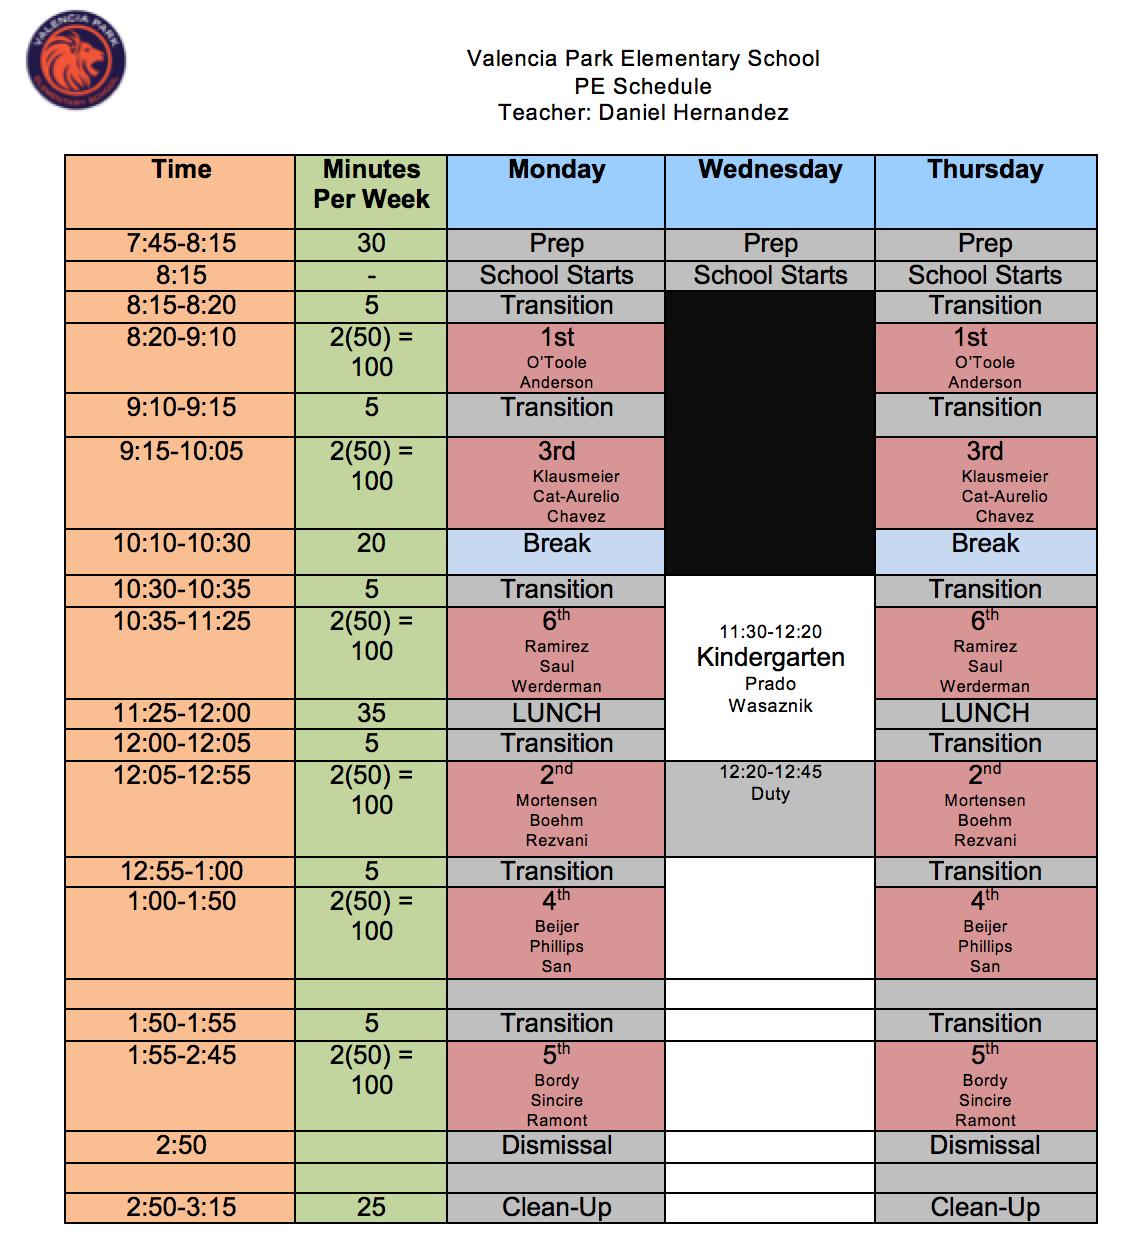 PE Schedule 2019-20